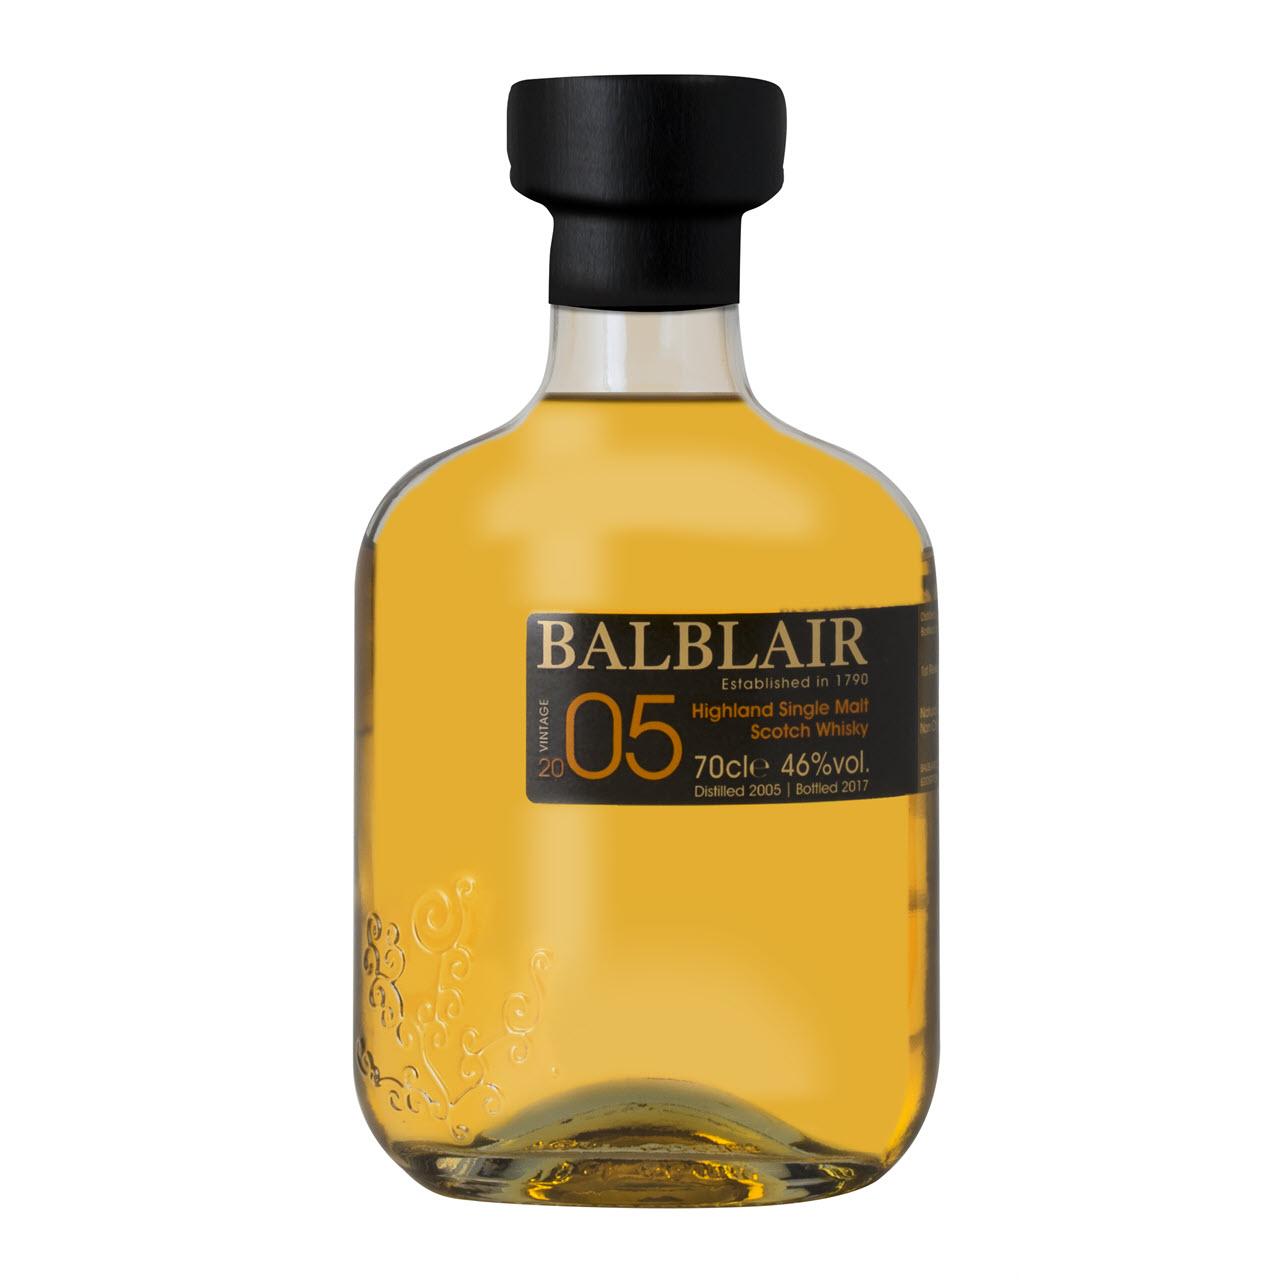 Balblair Vintage 2005 (2017)